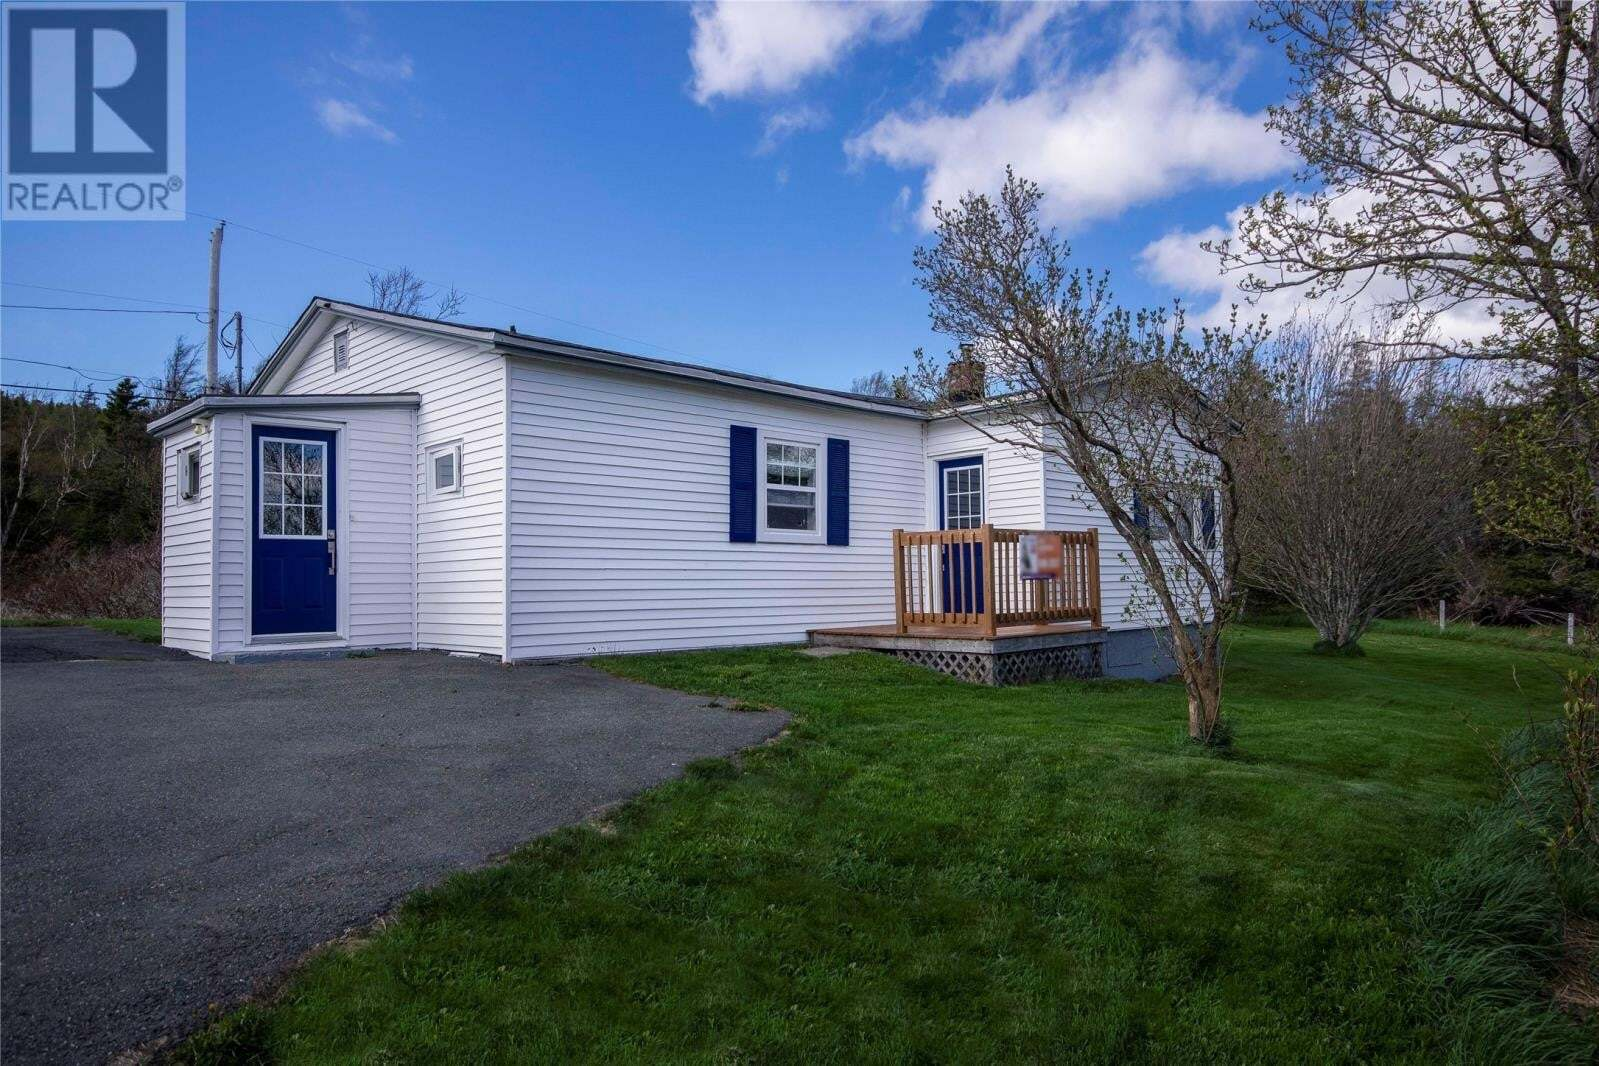 House for sale at 206 Indian Meal Line Torbay Newfoundland - MLS: 1211988